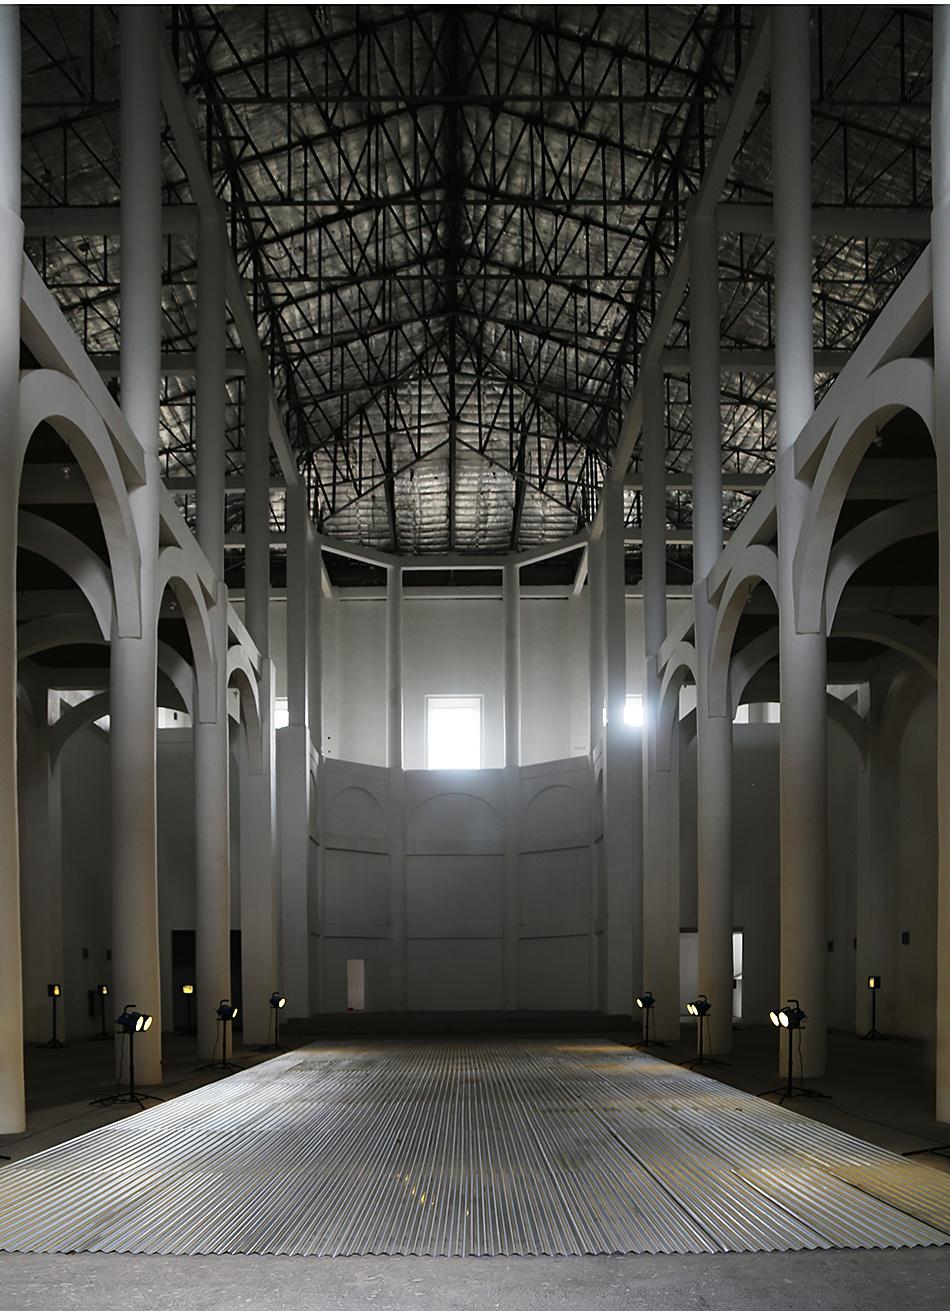 Fabian Fröhlich, Manila, Intramuros, San Ignacio (Manila Biennale, Onethingafteranother by Roberto Chabet)